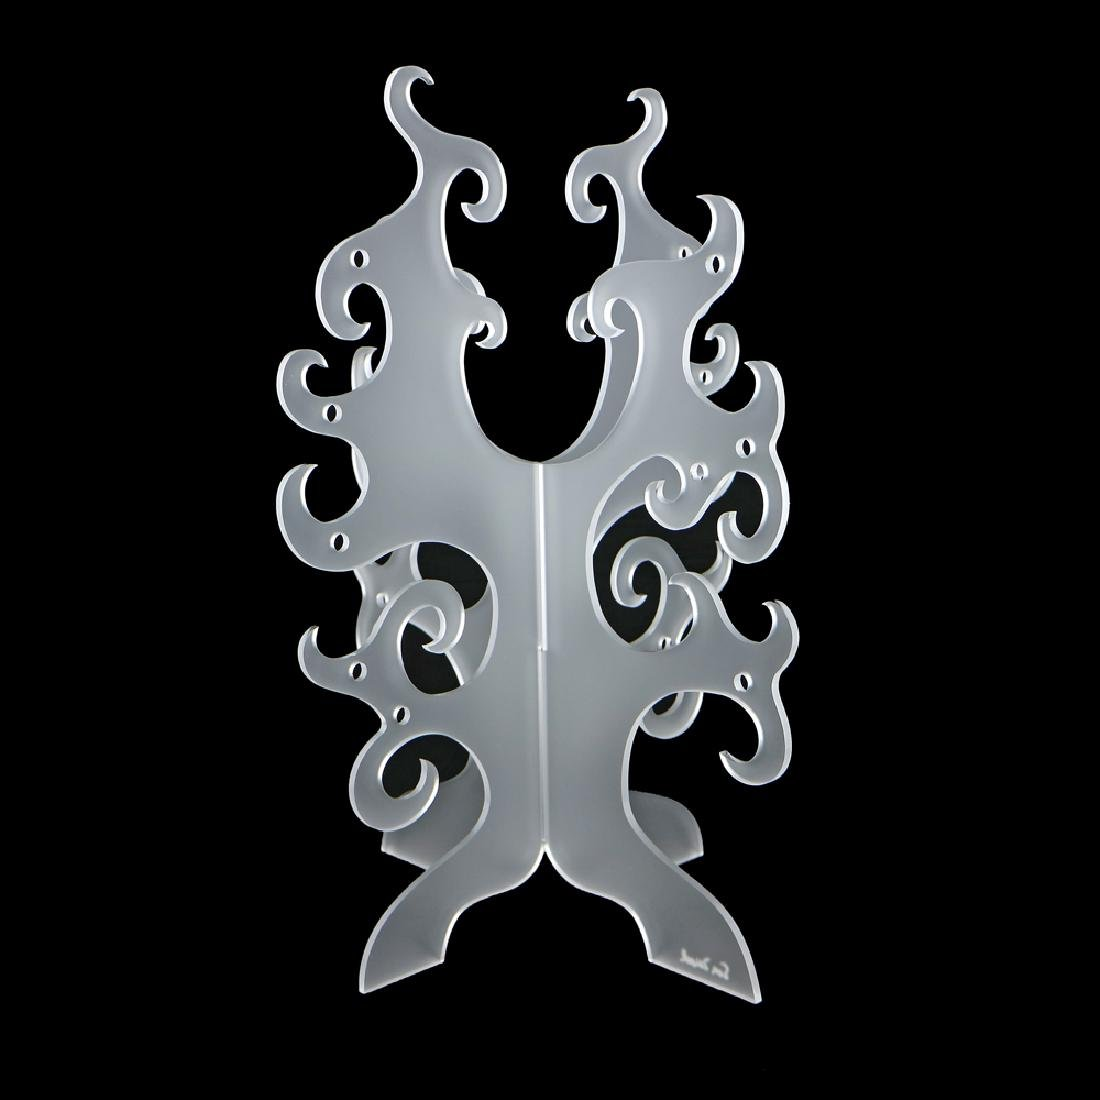 Zeisel EZO Acrylic Jewelry Tree